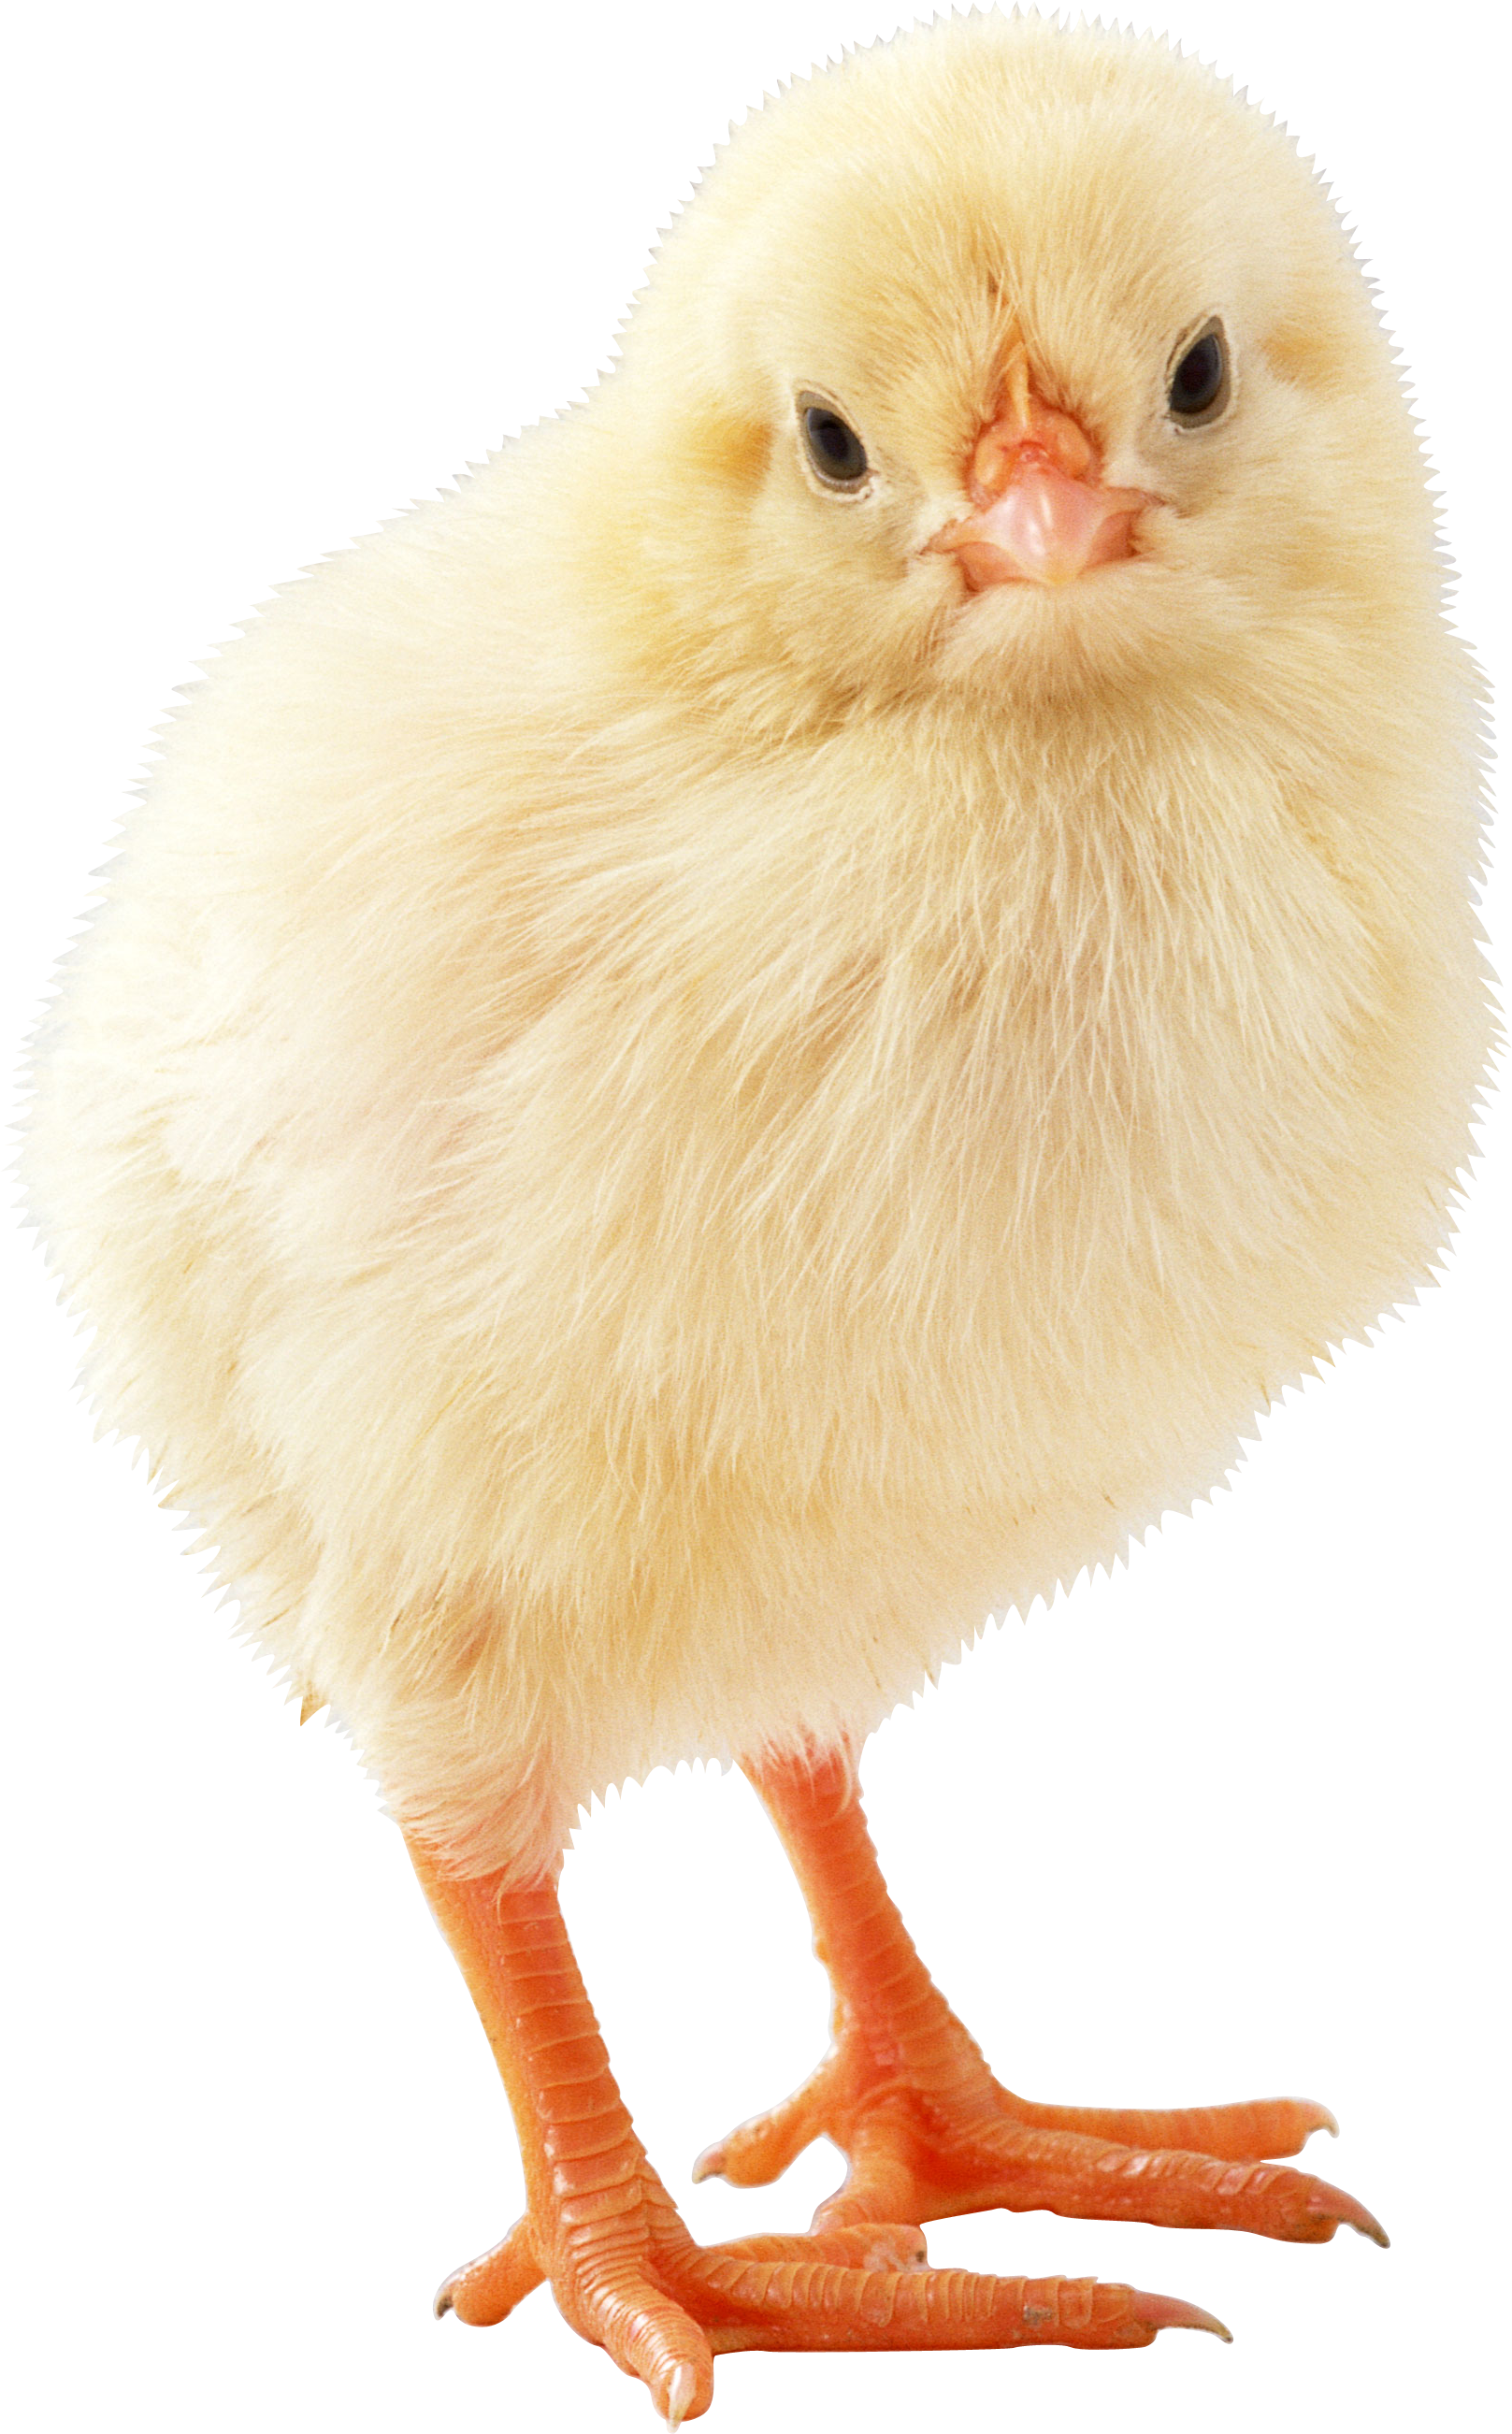 Цыплёнок. Фотография